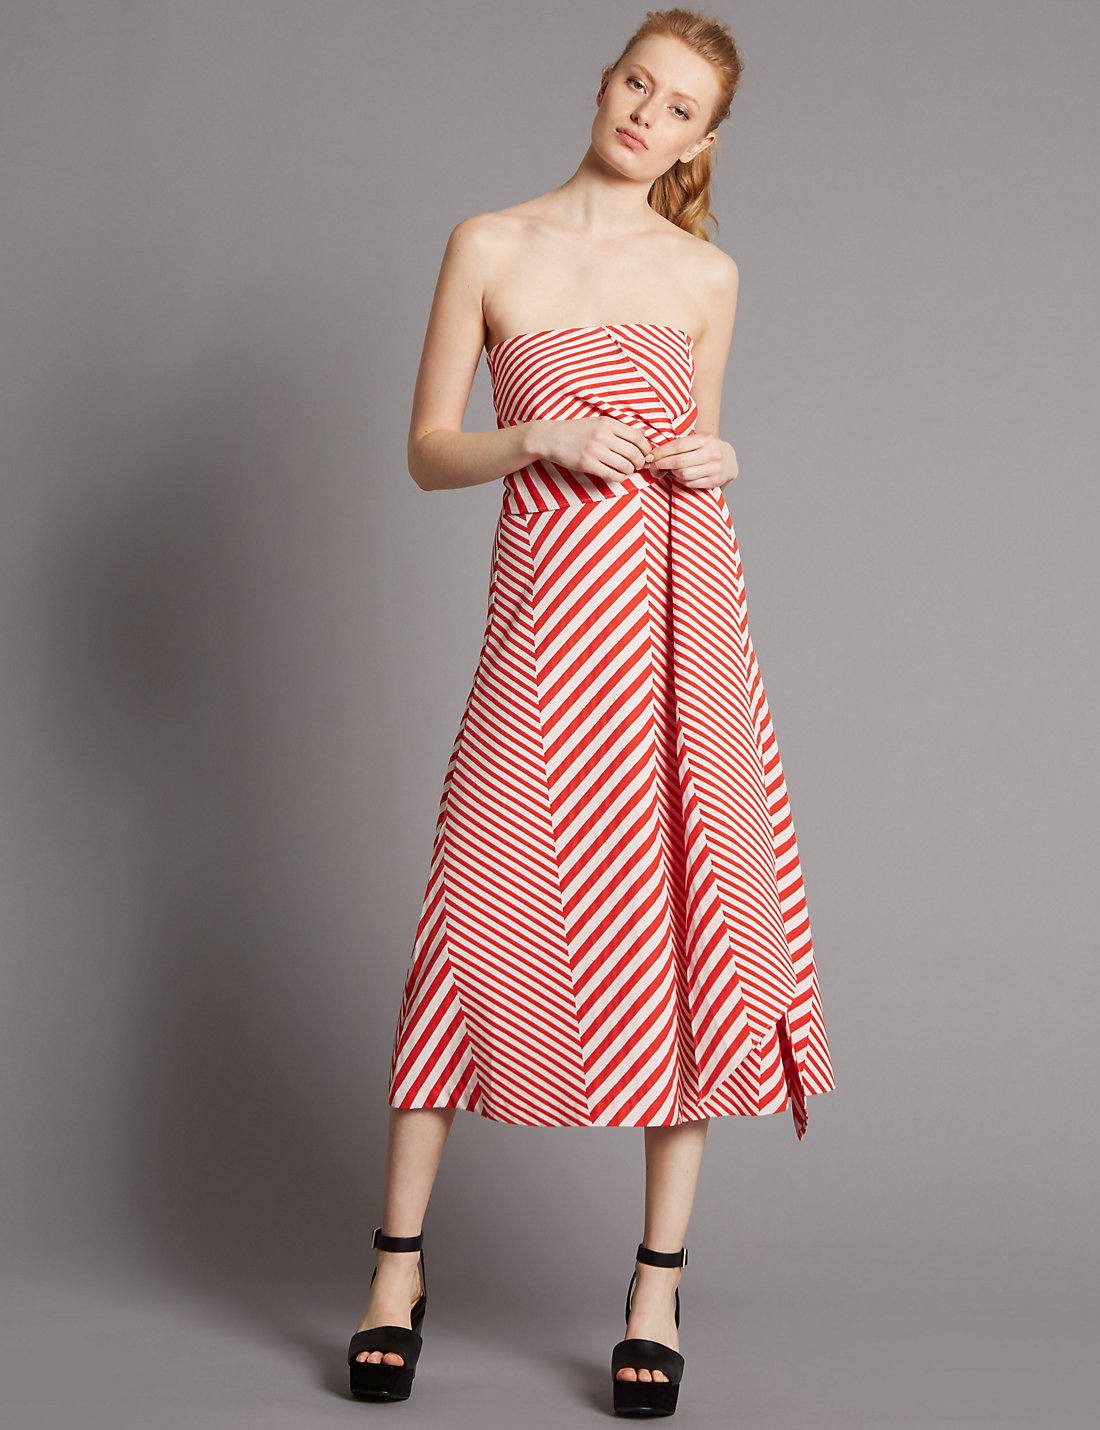 Cotton Blend Skater Dress